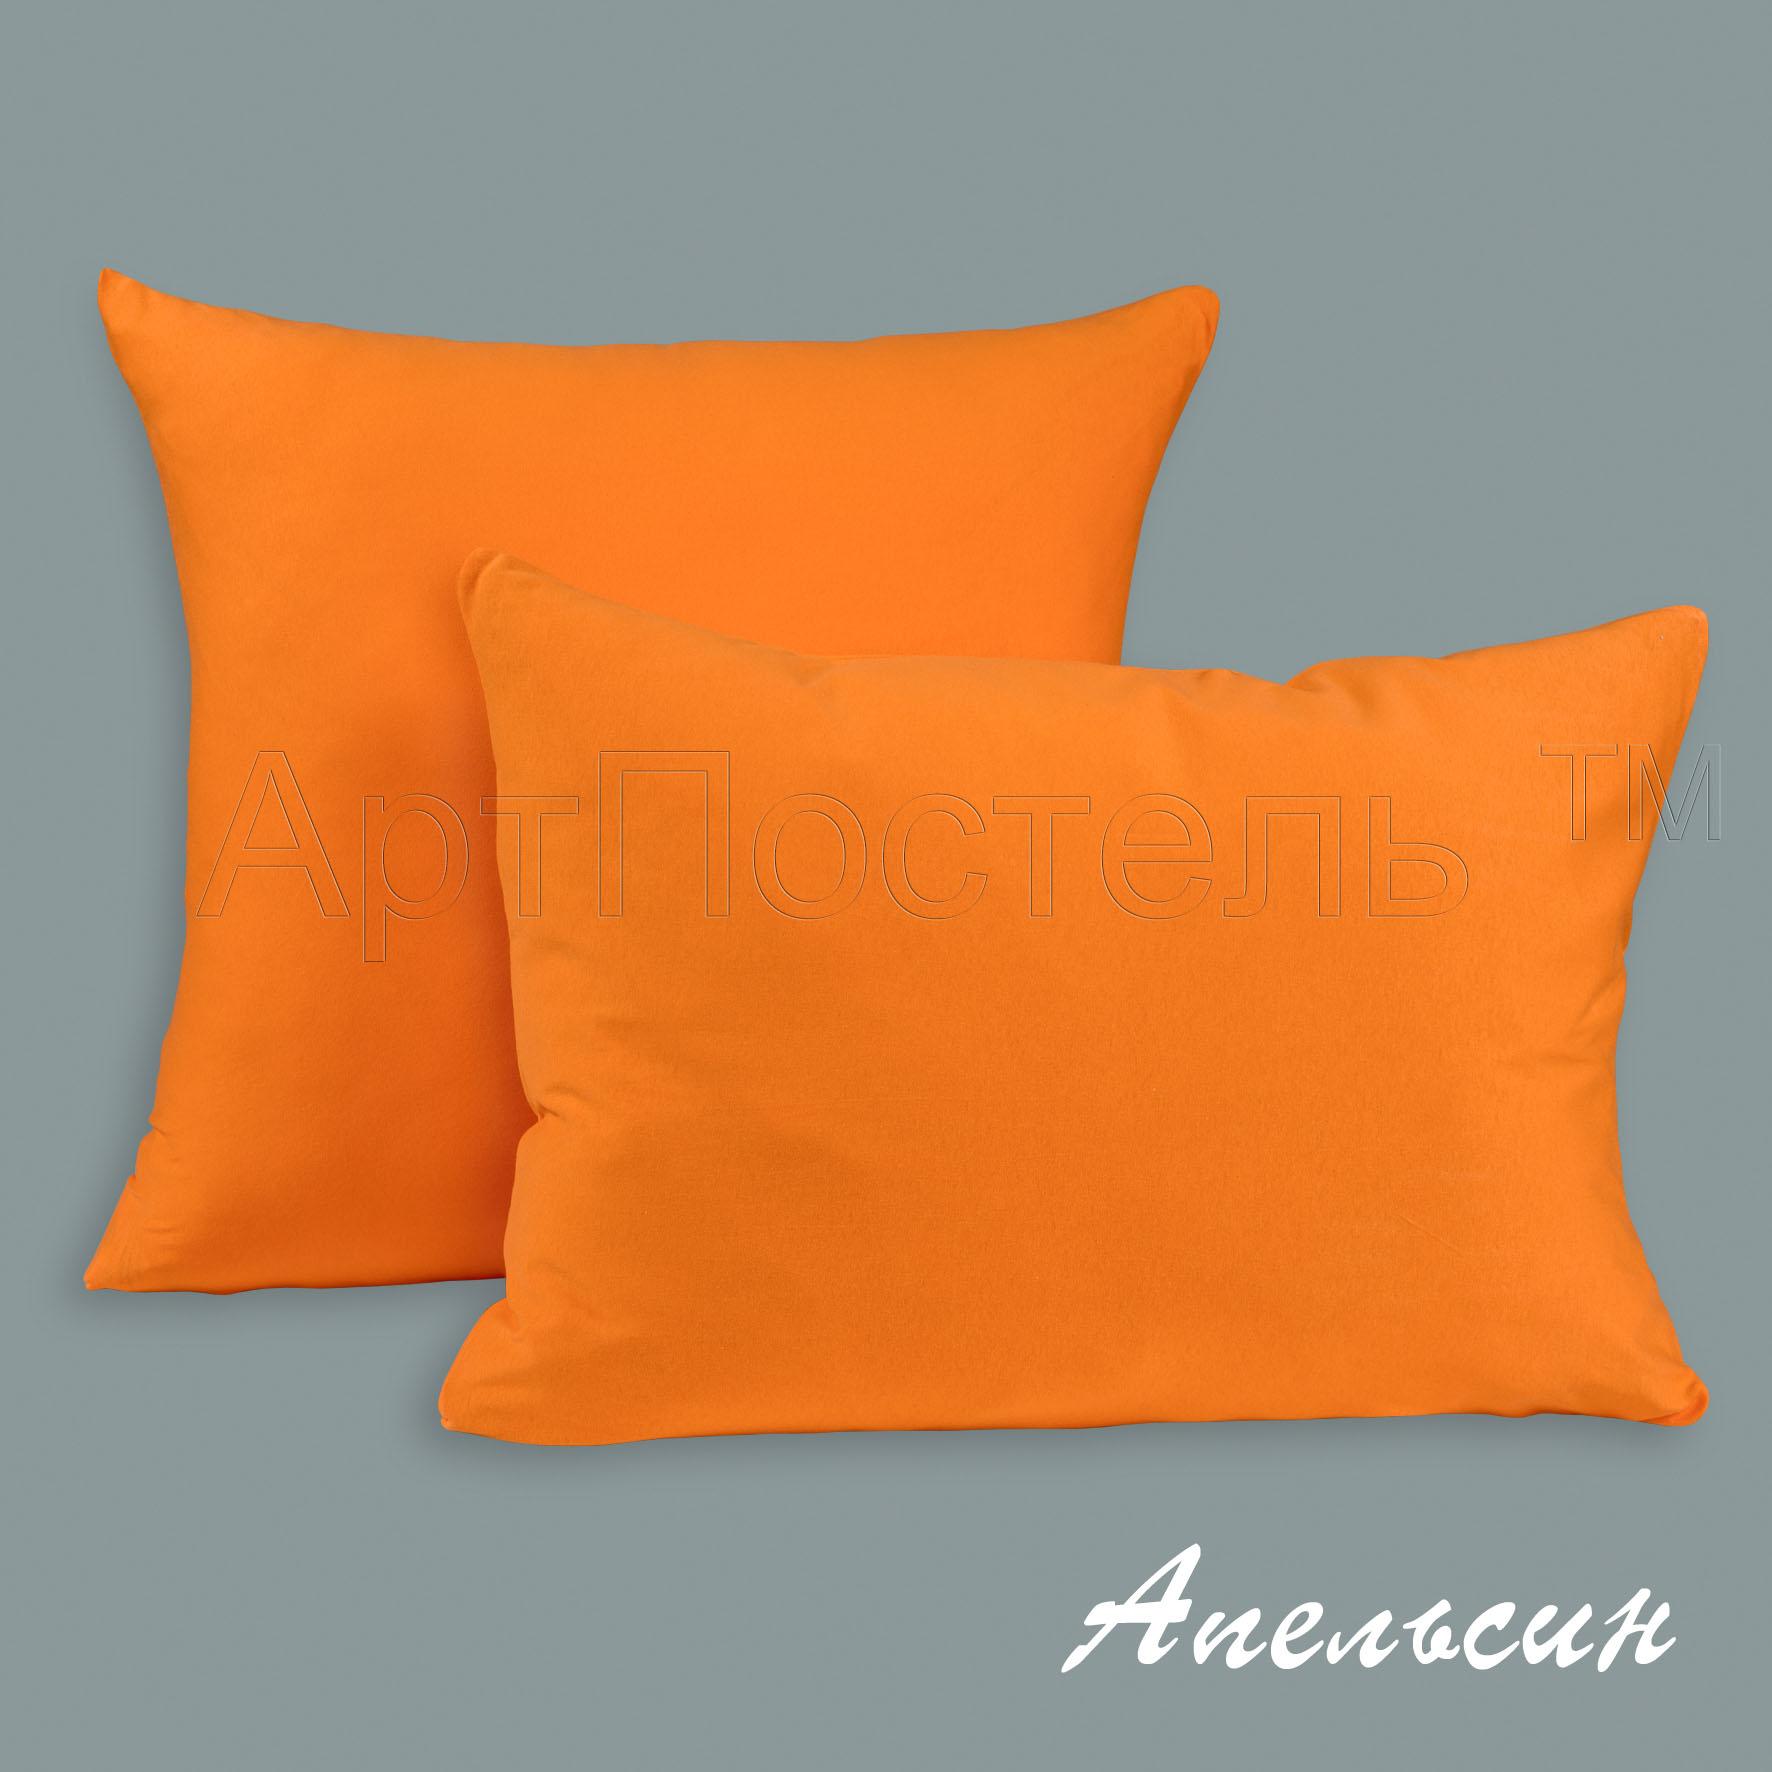 Наволочки Апельсин, размер 70х70 смНаволочки<br>Плотность ткани: 140 г/кв. м <br>Количество: 2 шт.<br><br>Тип: Наволочки<br>Размер: 70х70<br>Материал: Кулирка